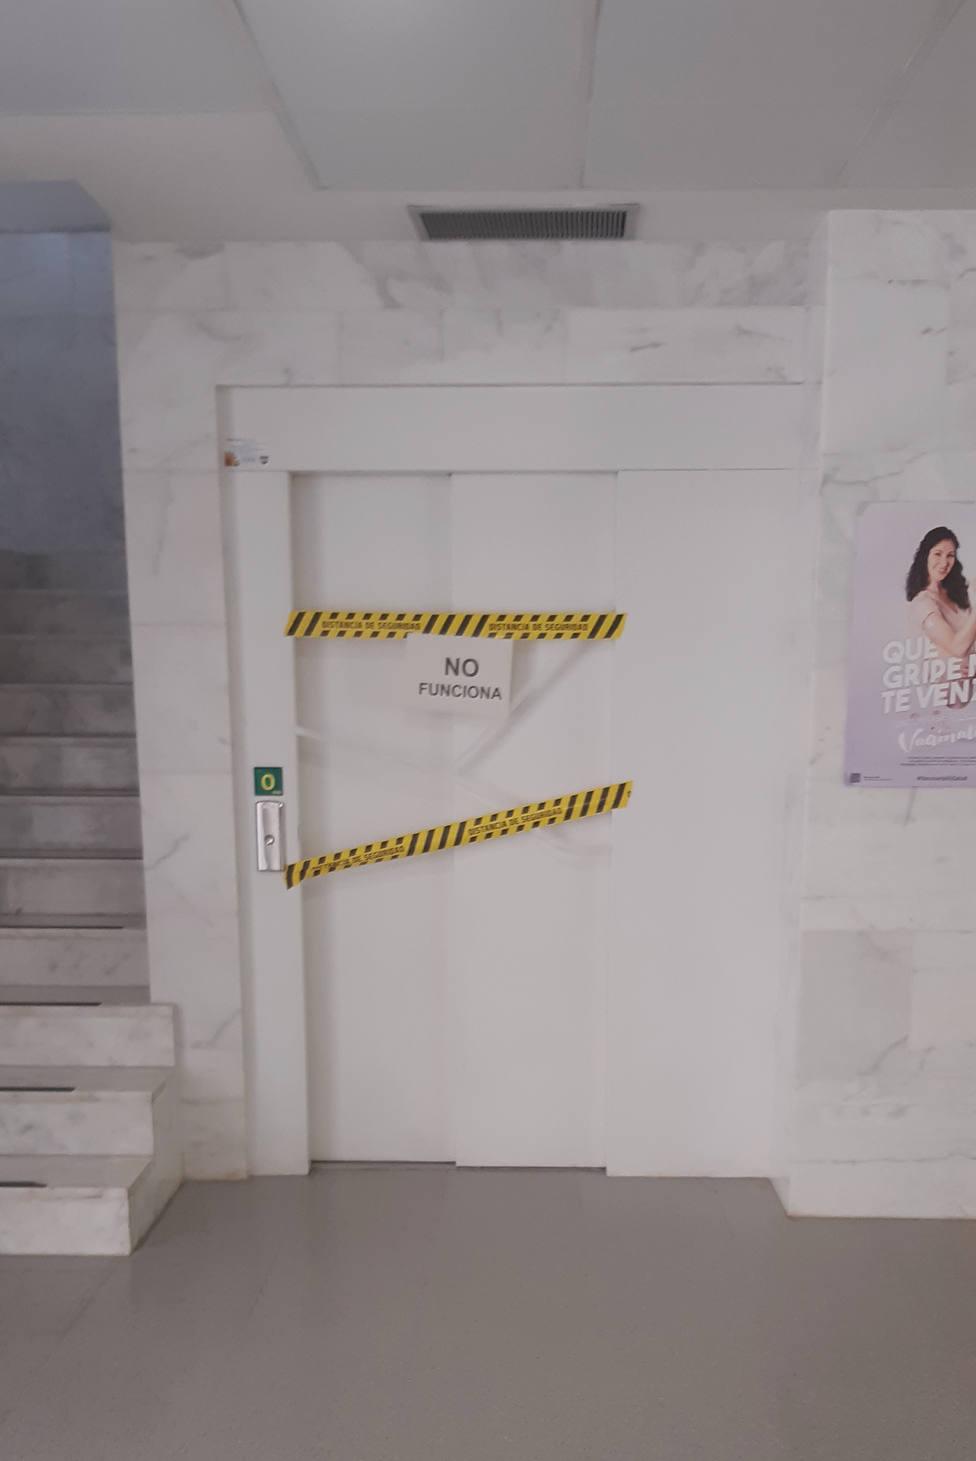 ctv-tym-avera-ascensor-fernando-el-catlico-csif-castelln